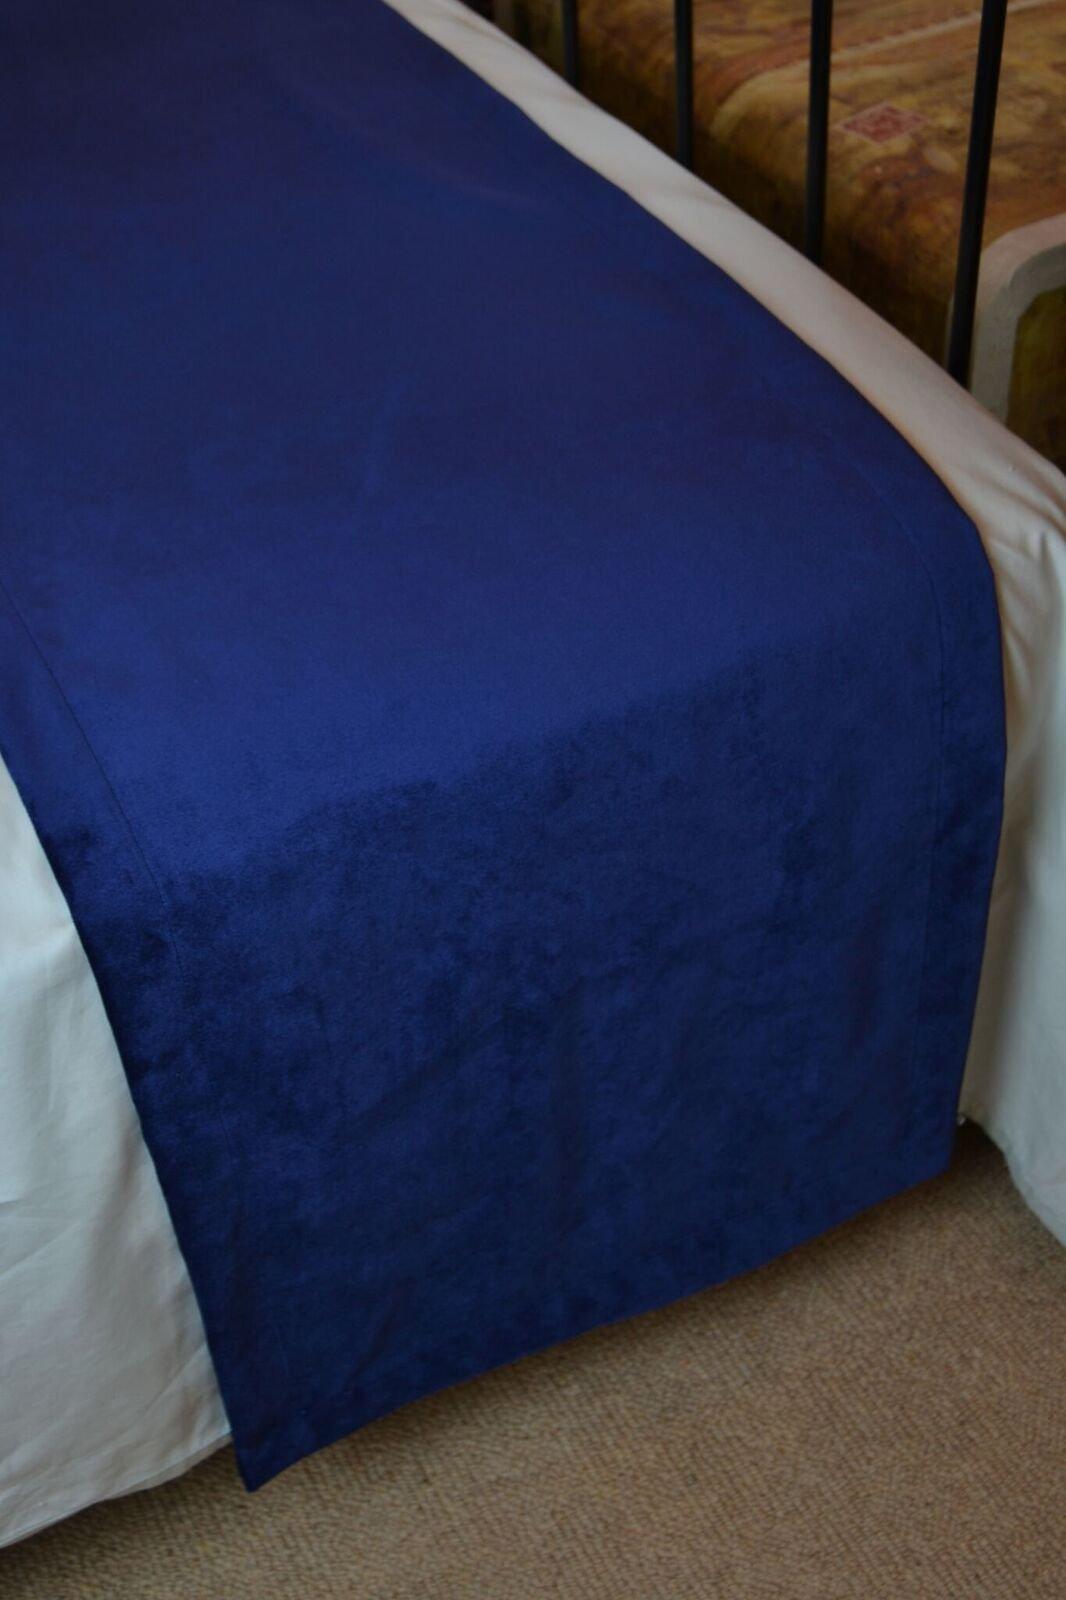 McAlister Matt Velvet | Decorative Bed Runner Scarf | 20x95 Navy Blue | Lush, Plush & Soft Classic Modern Accent Décor